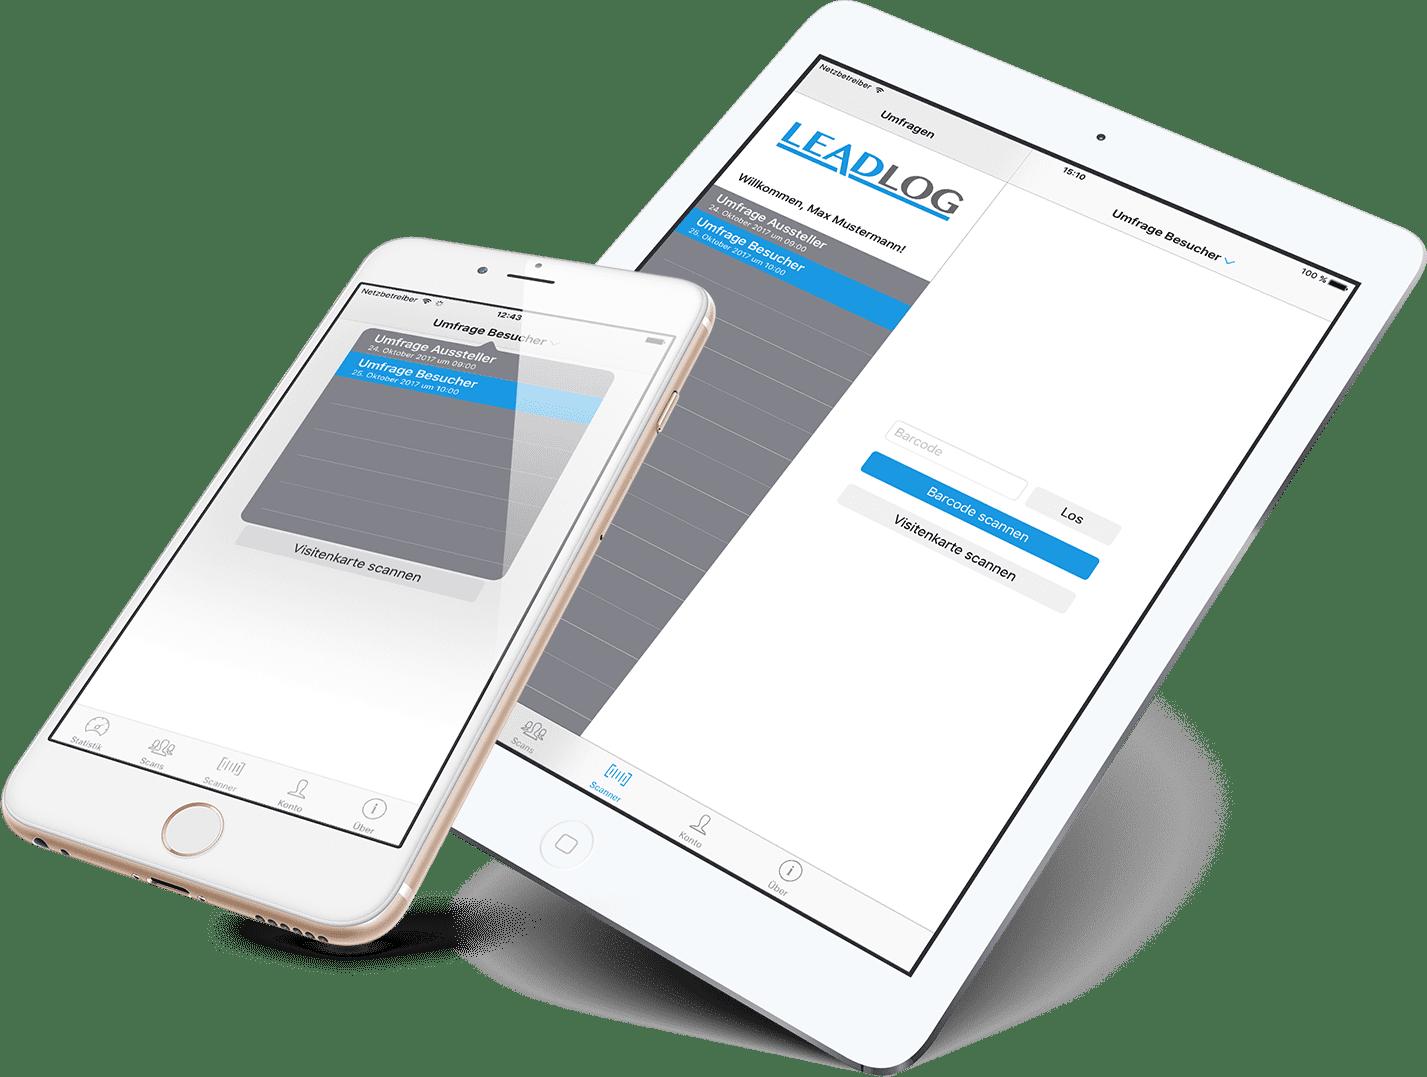 LeadLog auf iPhone und iPad